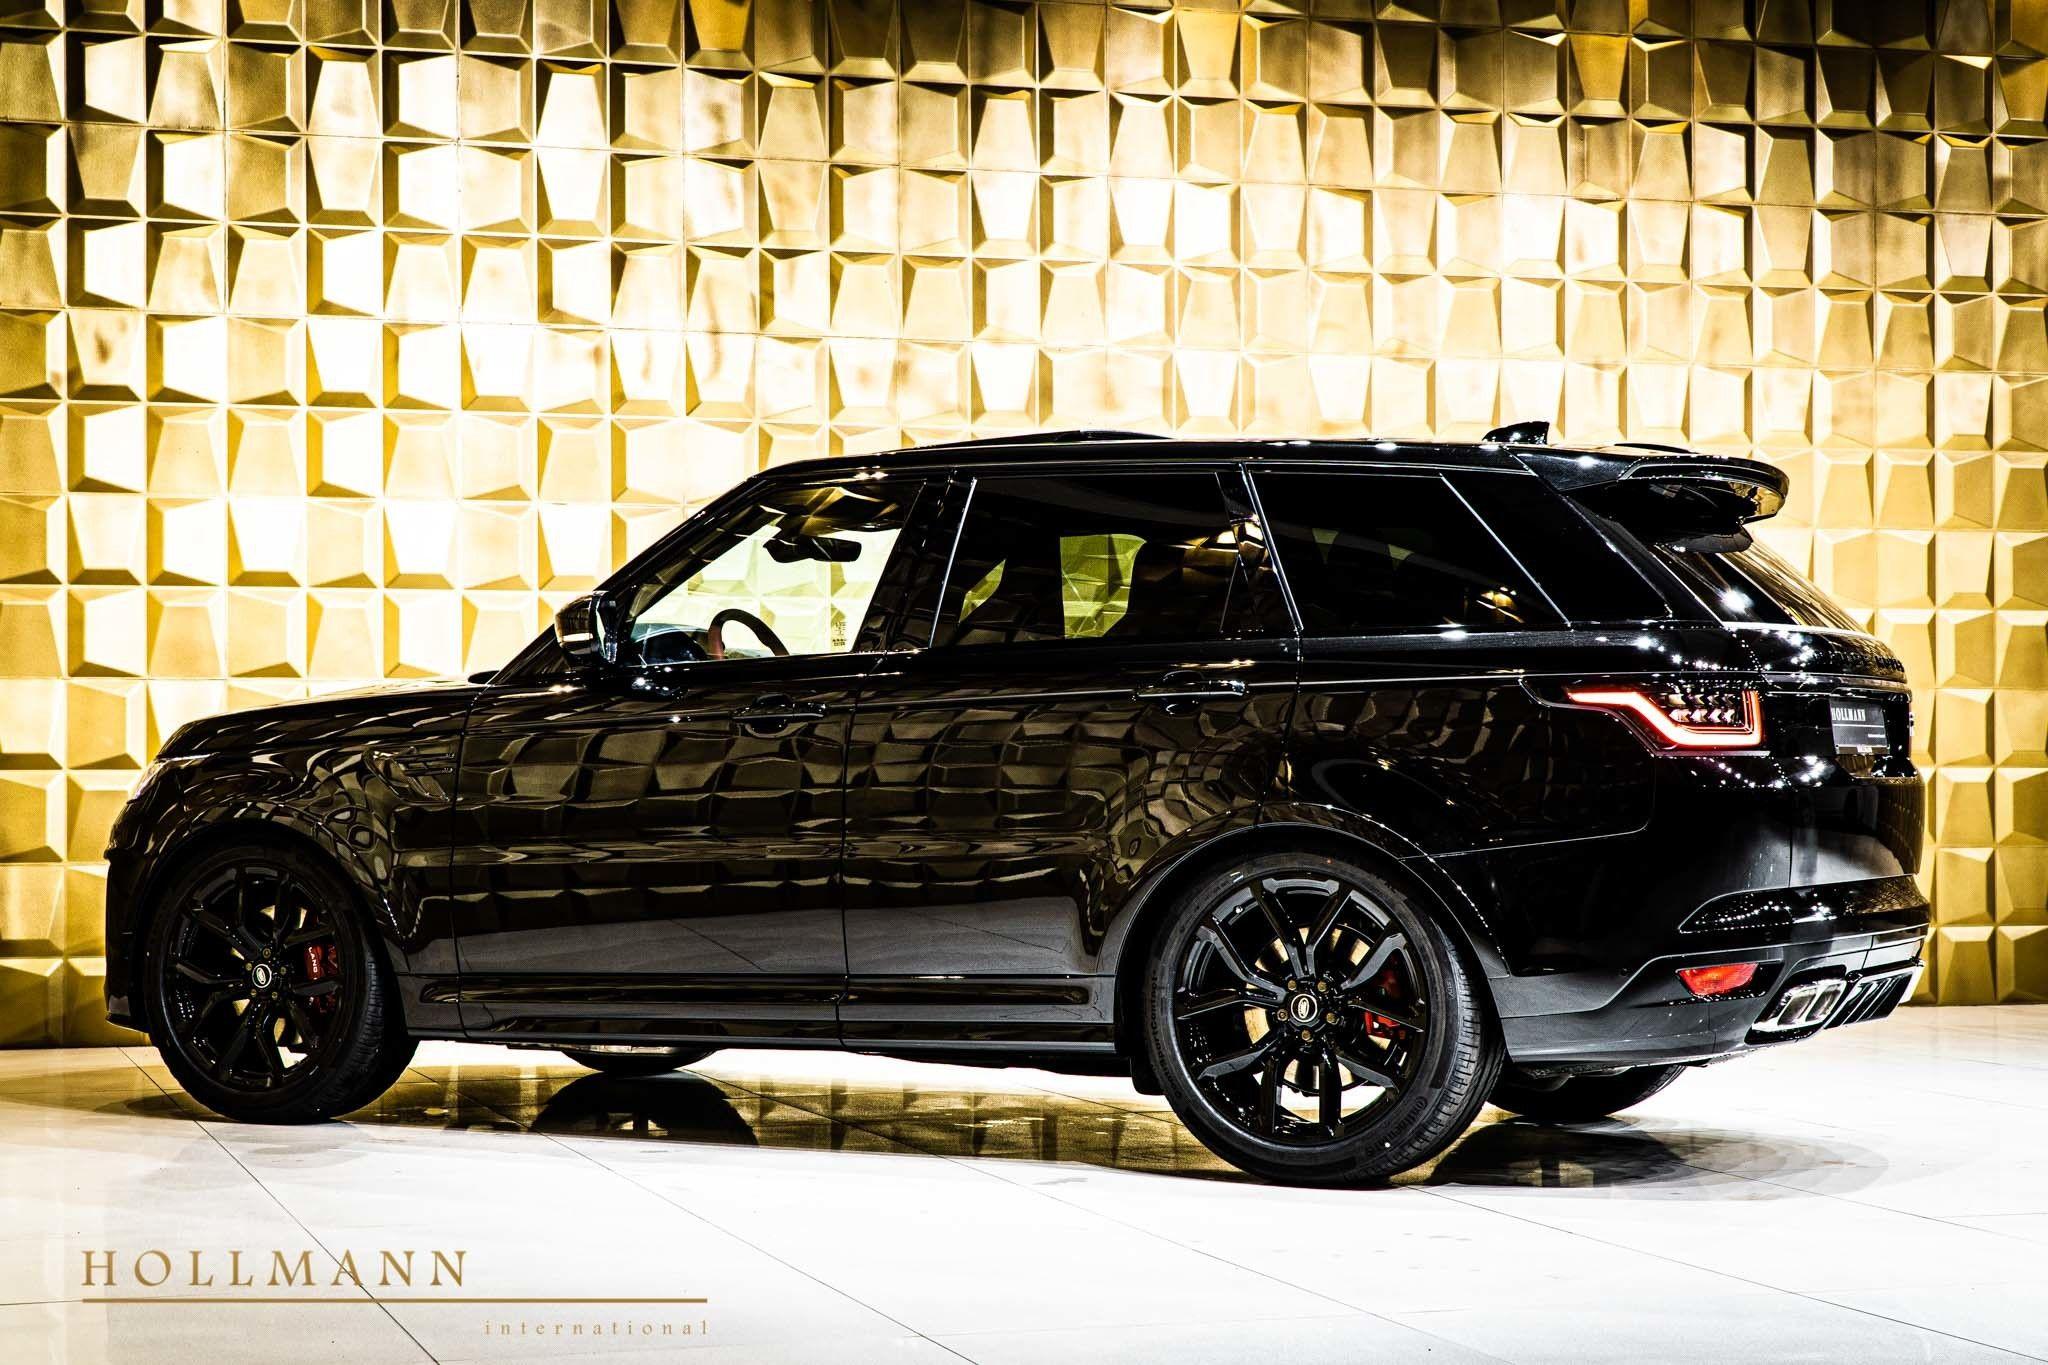 Land Rover Range Rover Sport 5 0 V8 Svr Hollmann International Germany For Sale On Luxurypulse Range Rover Range Rover Sport All Black Range Rover